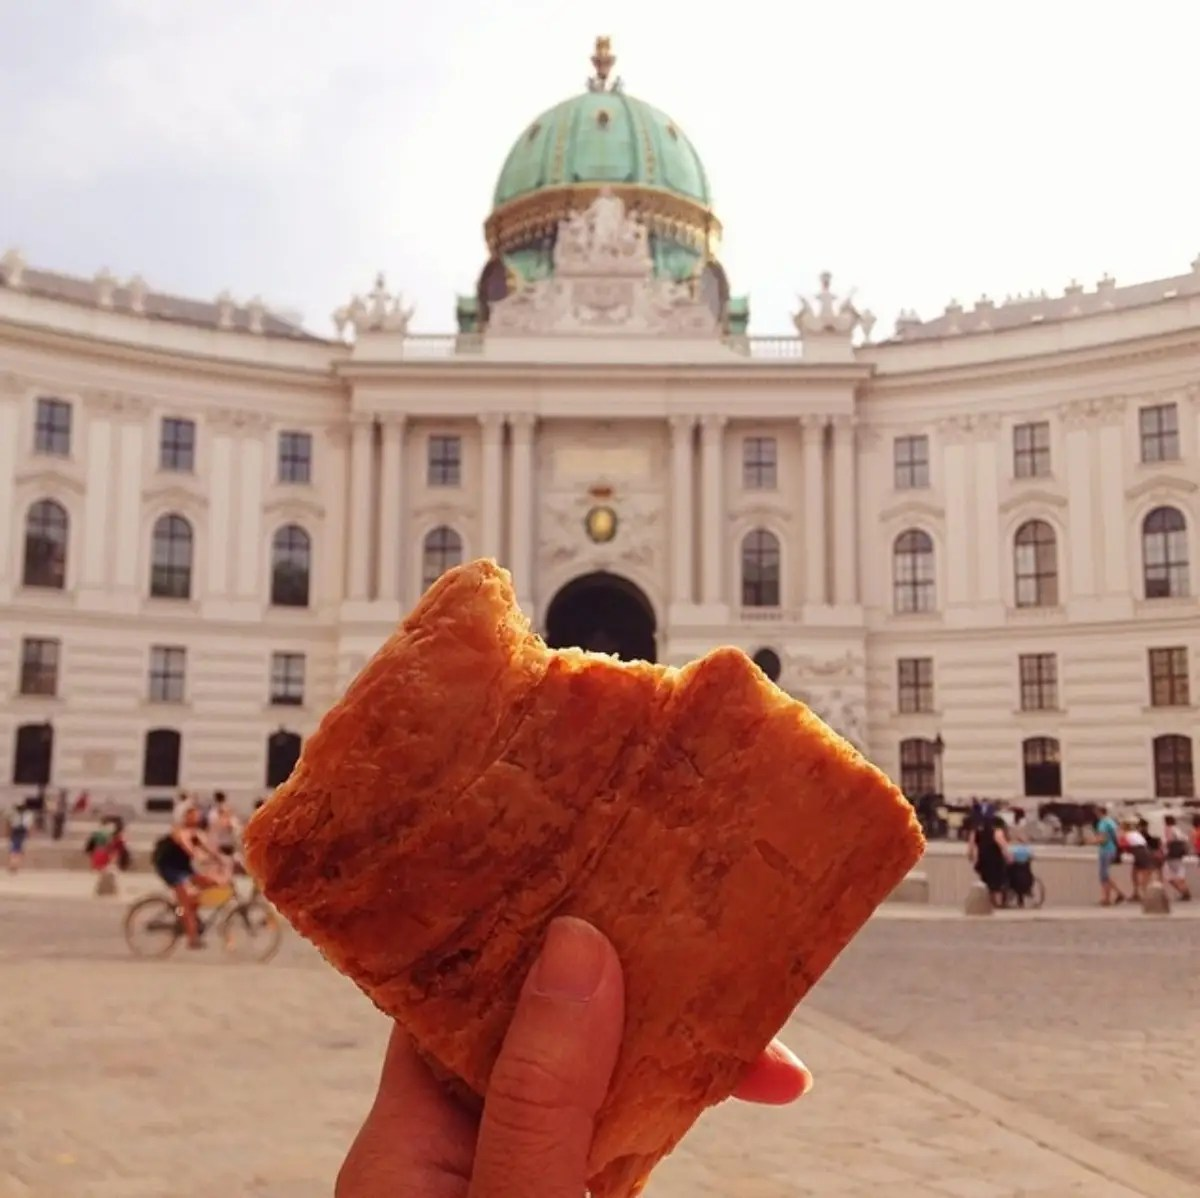 An apfelstrudel in Vienna.